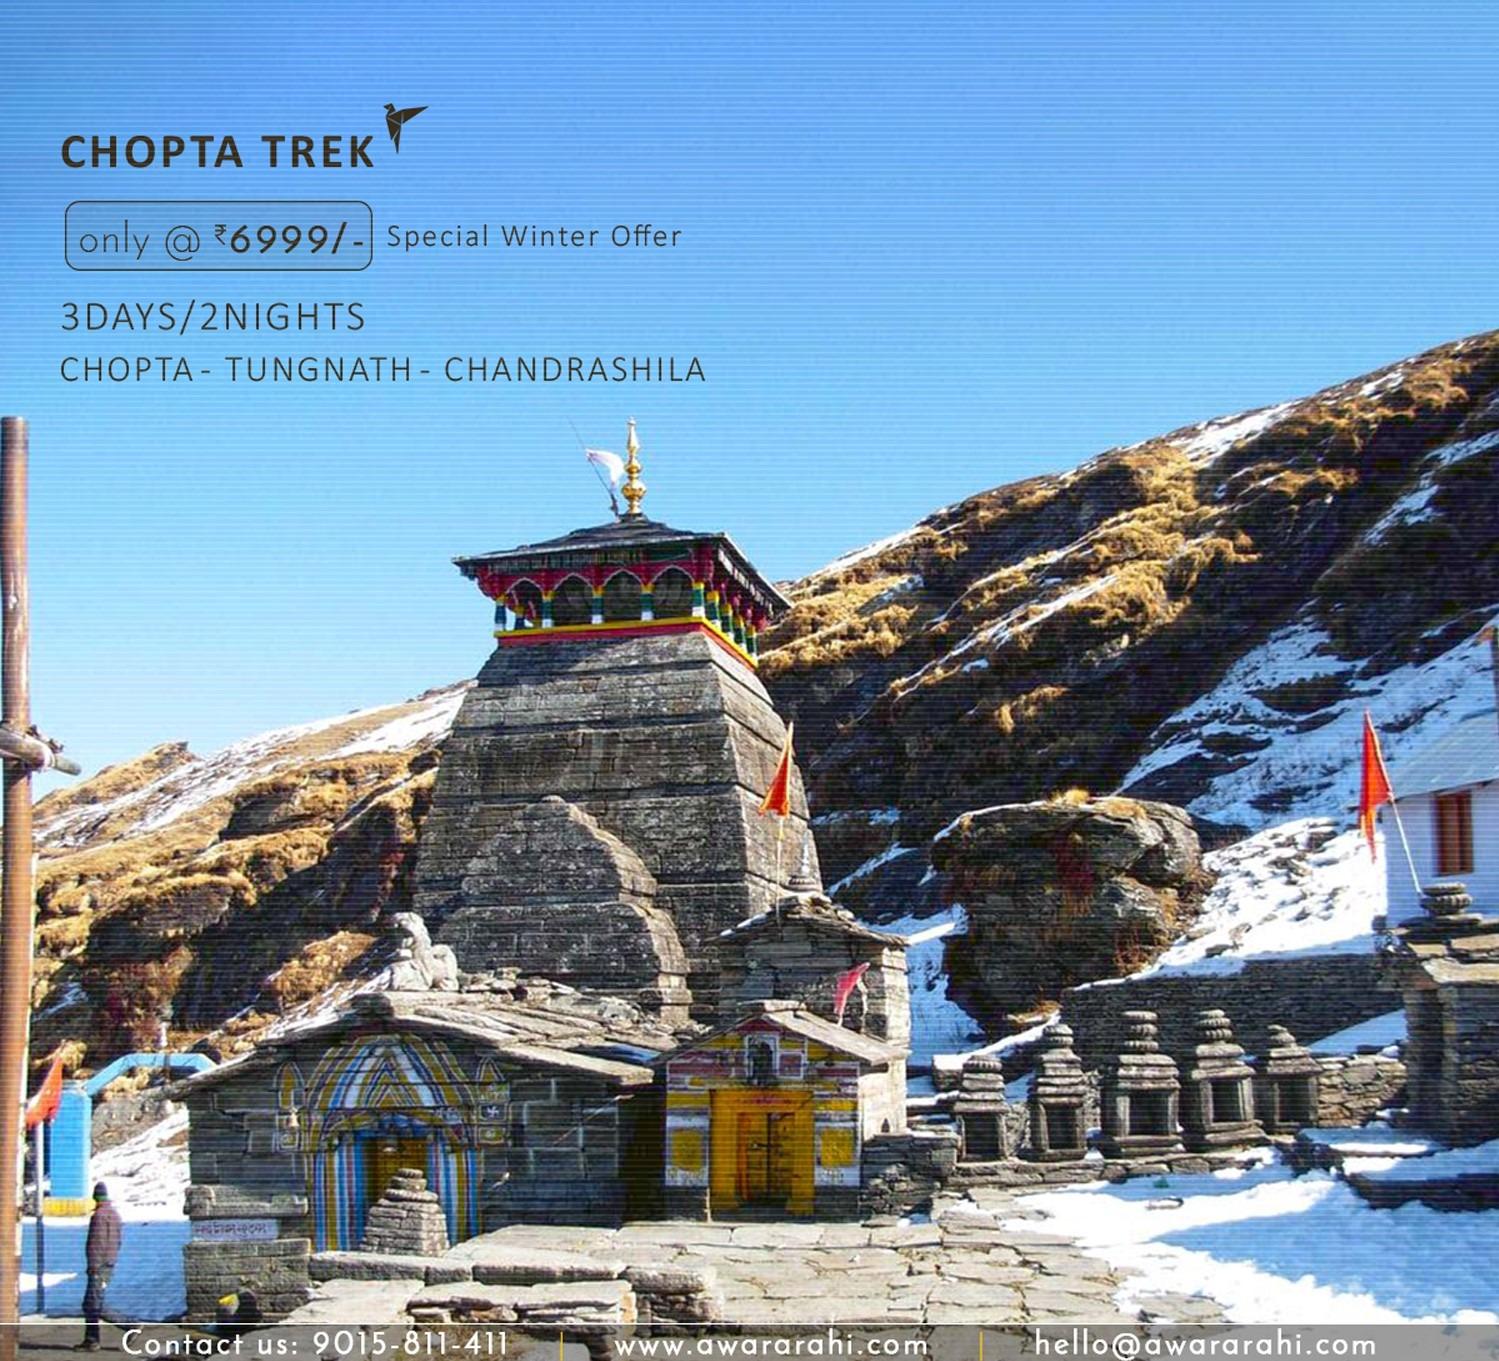 Awararahi-chopta-trek-promo